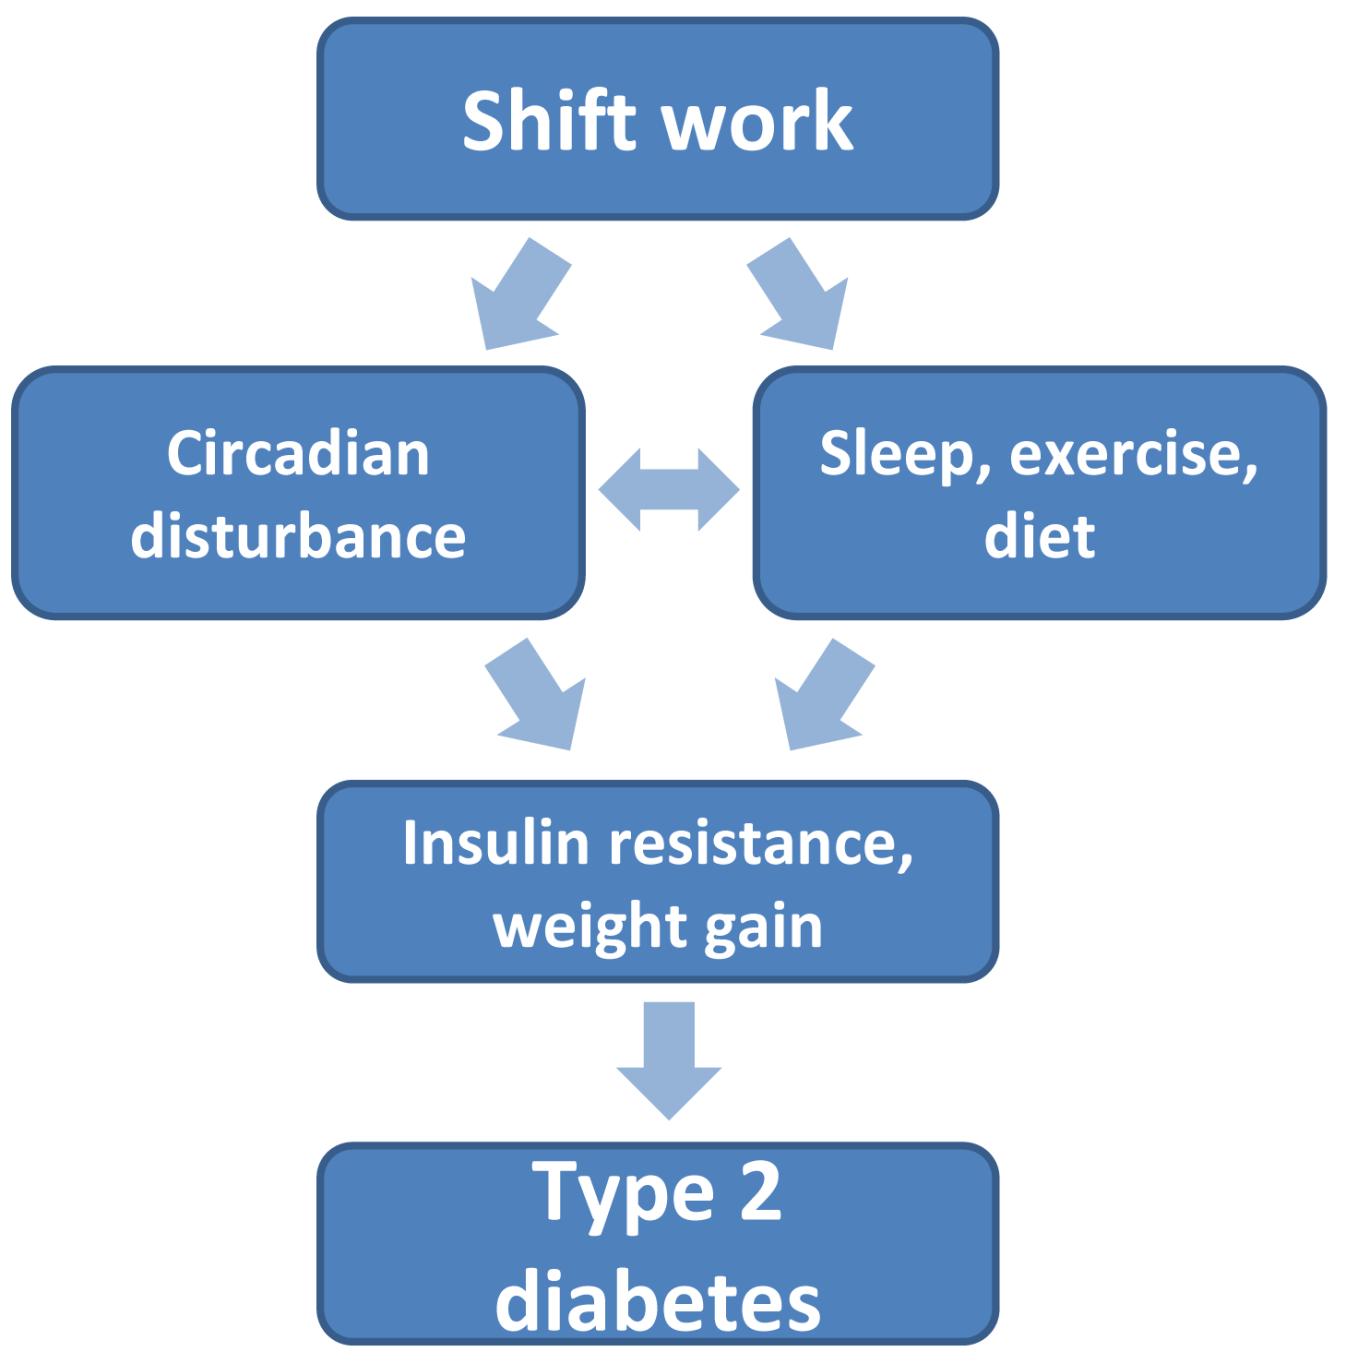 Links between shift work and type 2 diabetes.